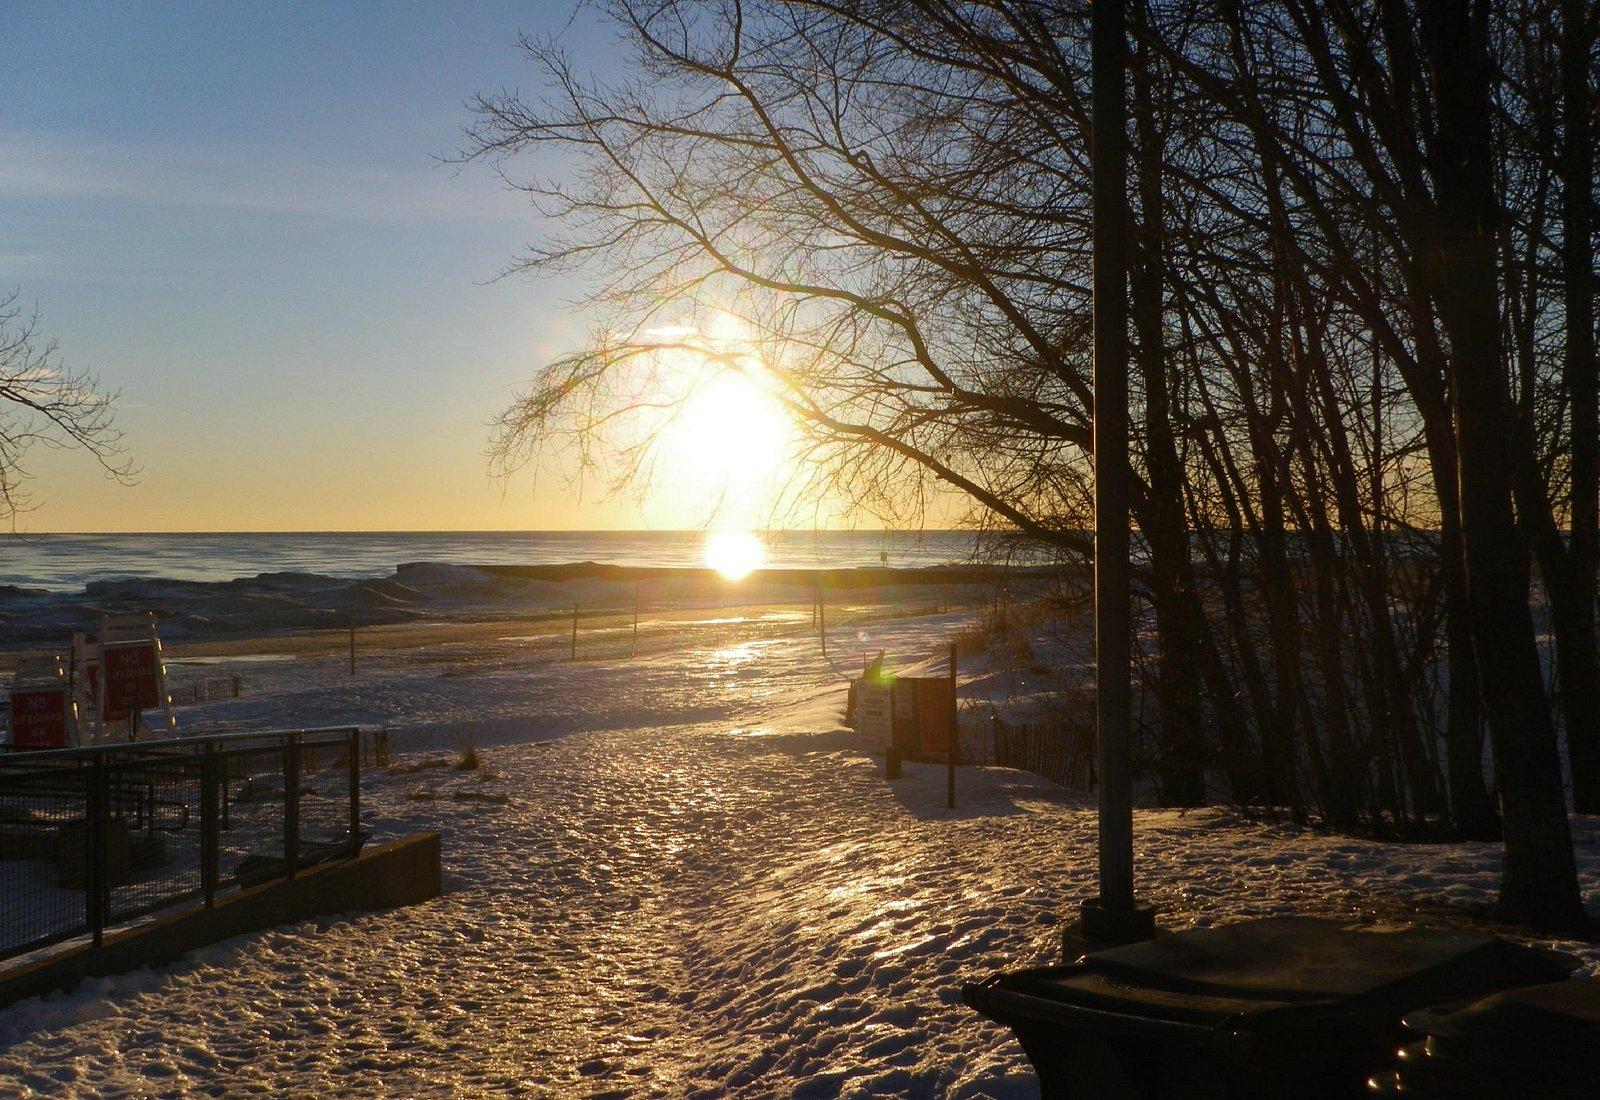 Sunrise in winter on Lighthouse beach Lake Michigan